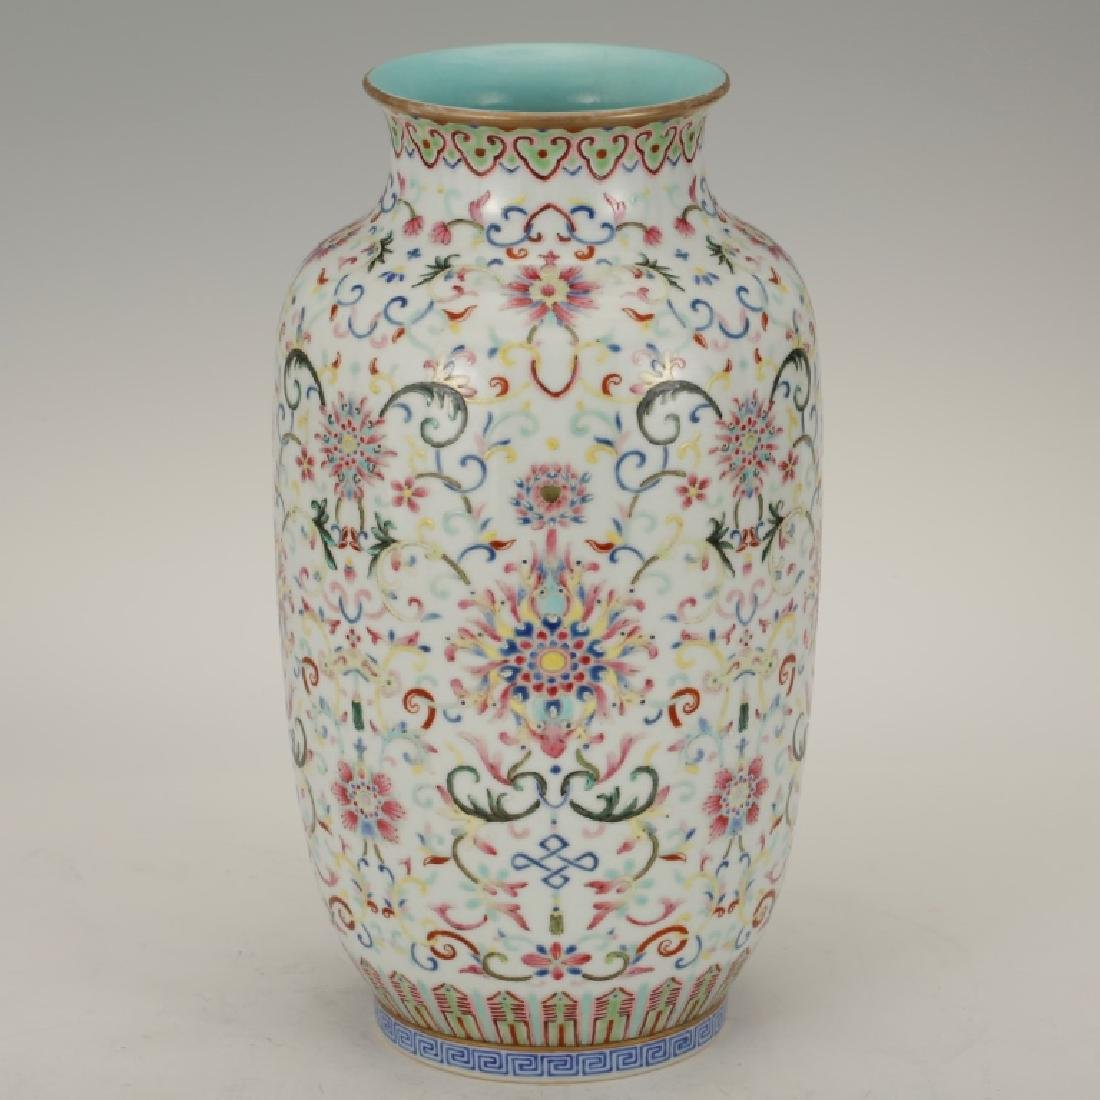 Chinese 19th C Famille Rose Enameled Porcelain